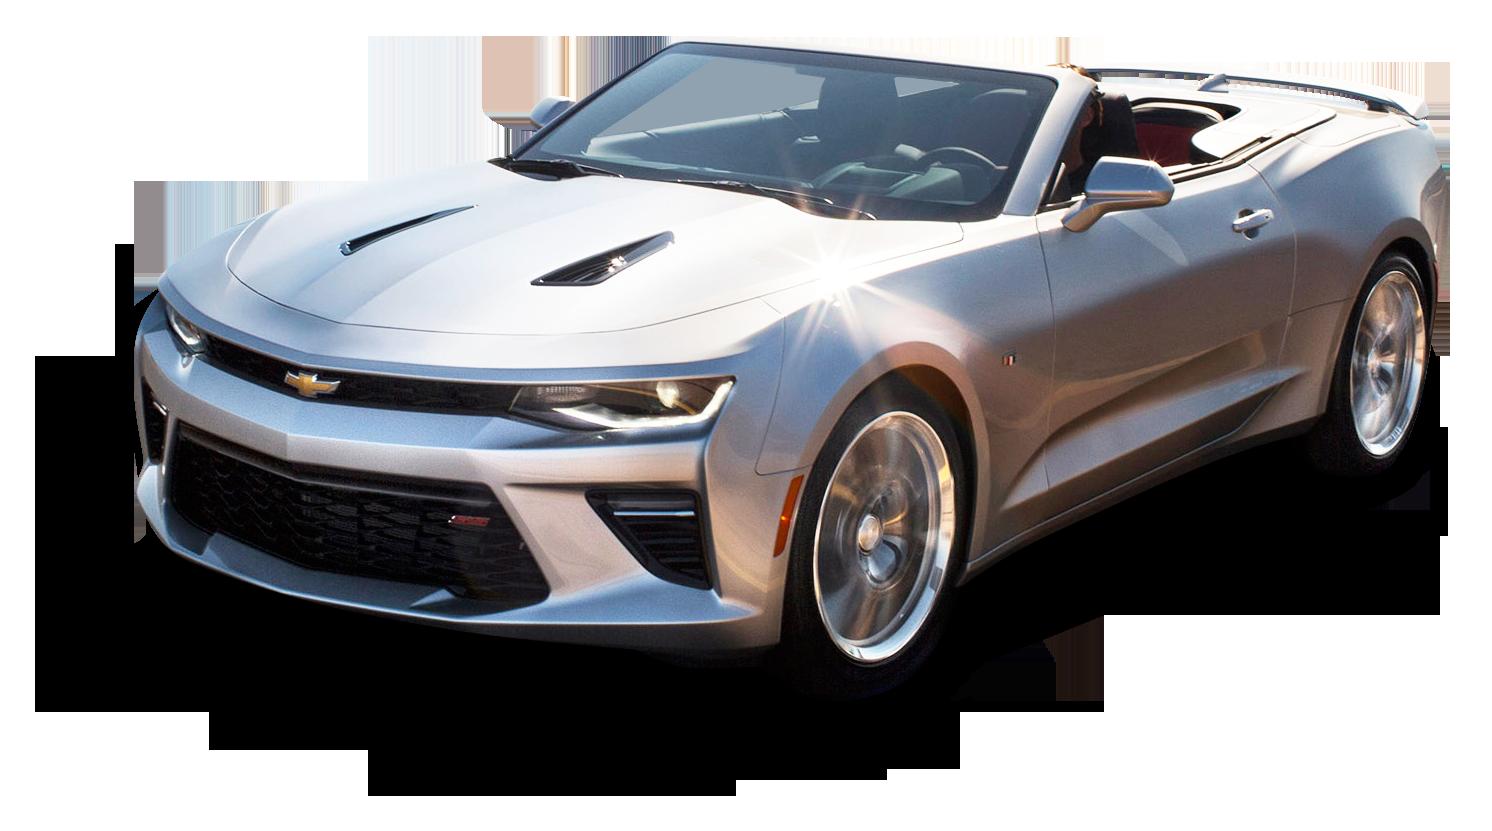 Chevrolet Camaro Convertible Silver Car PNG Image